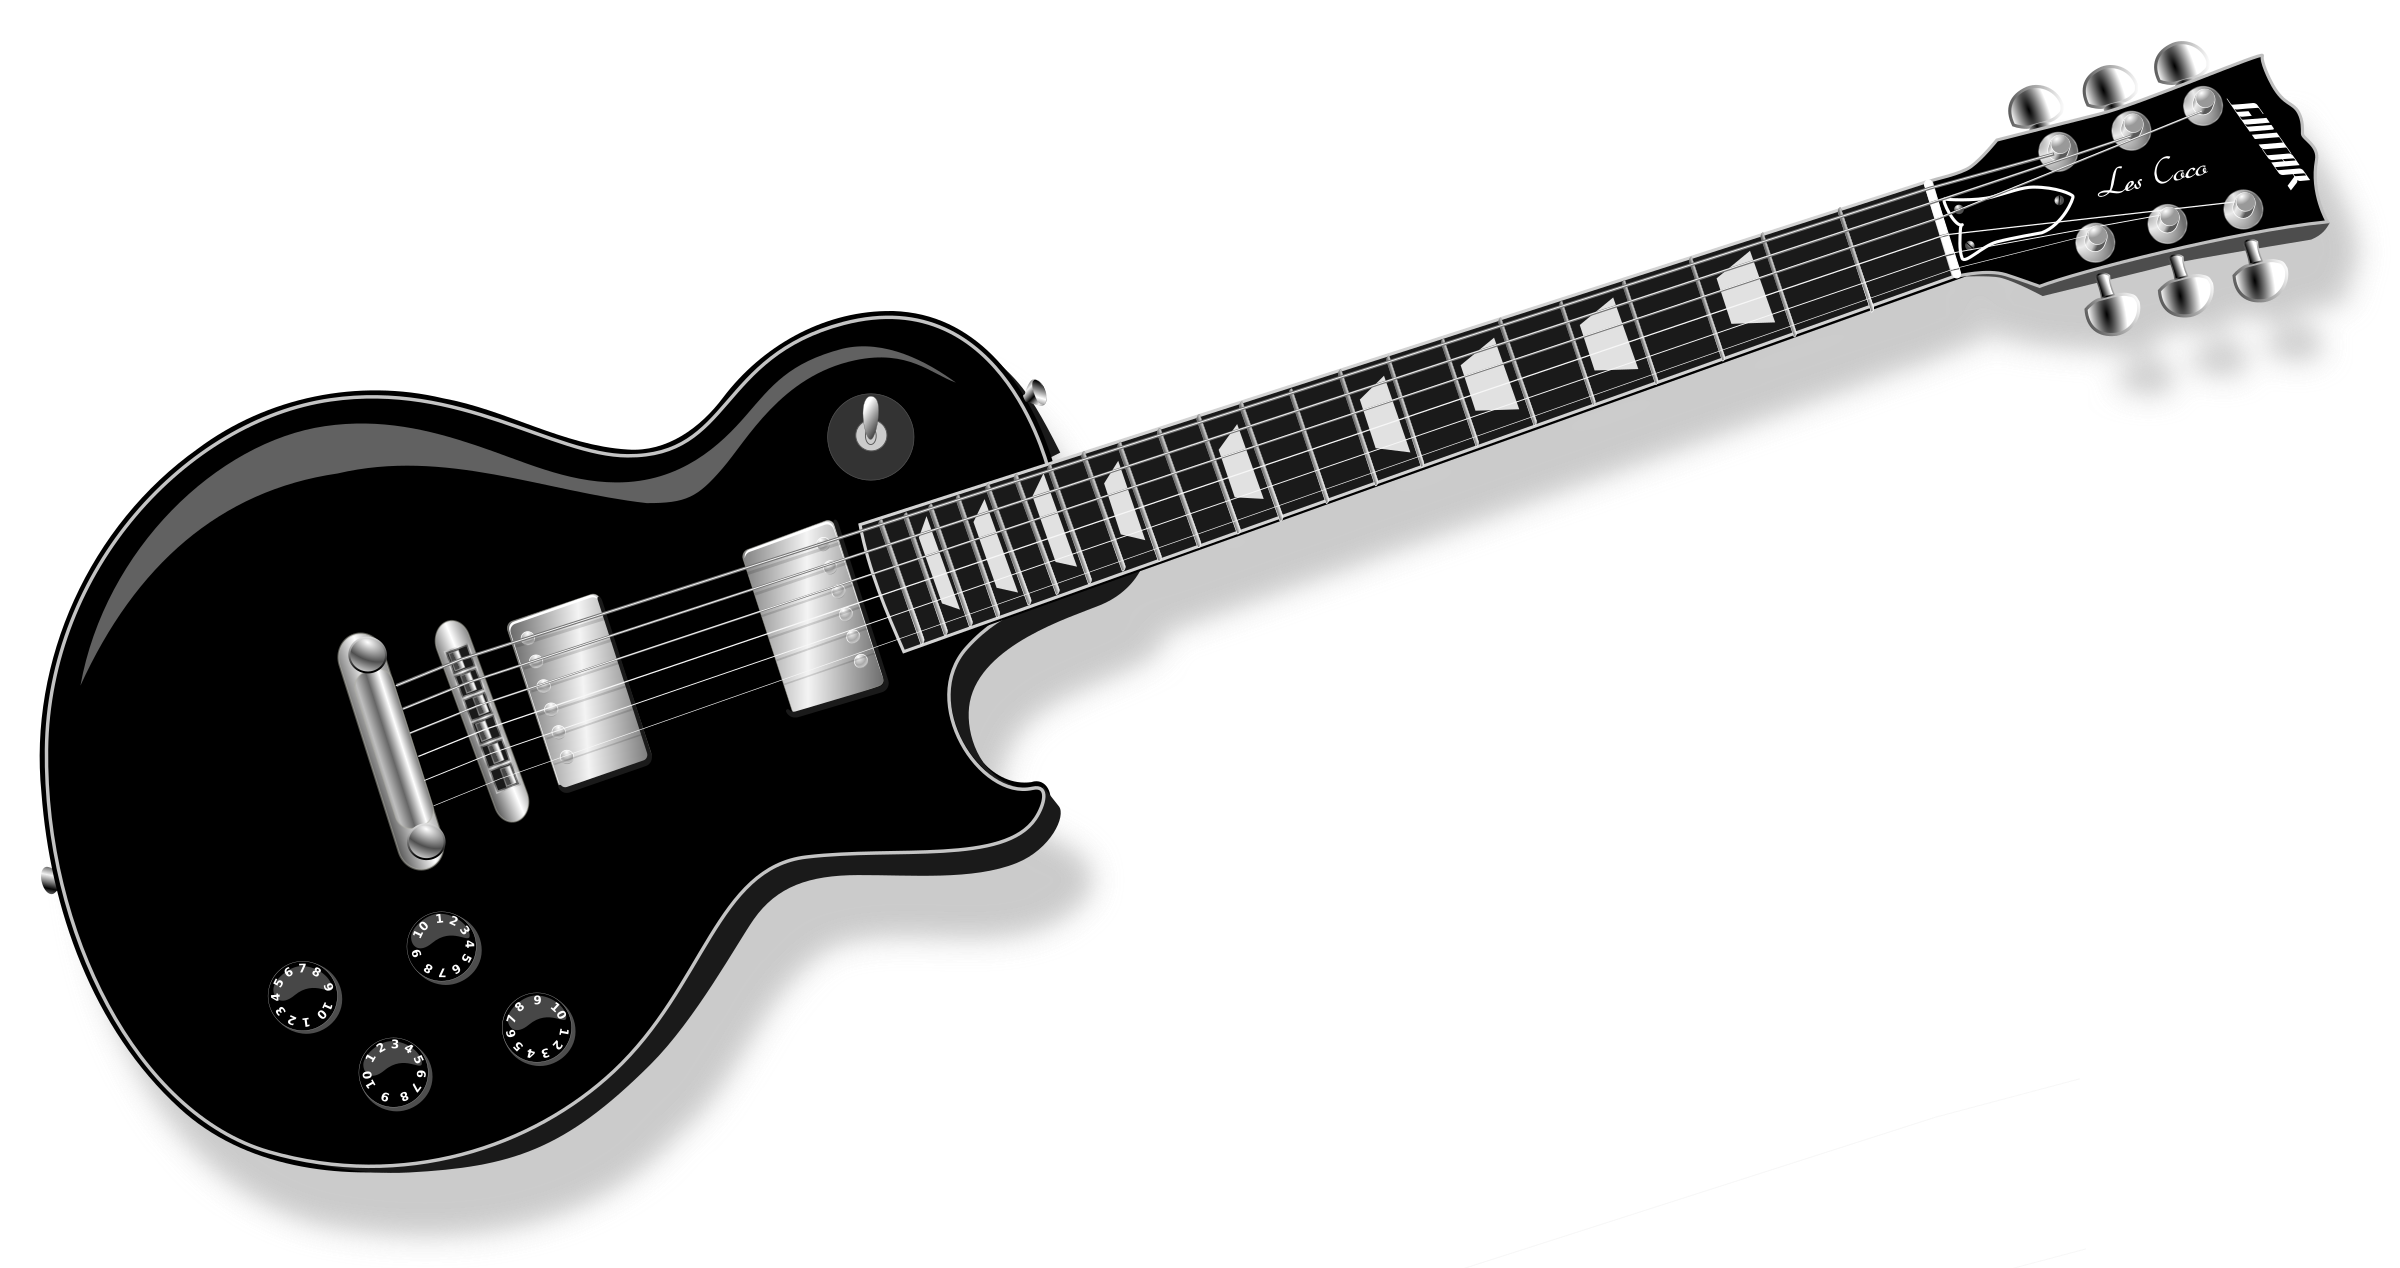 Lp black big image. Clipart guitar cool guitar